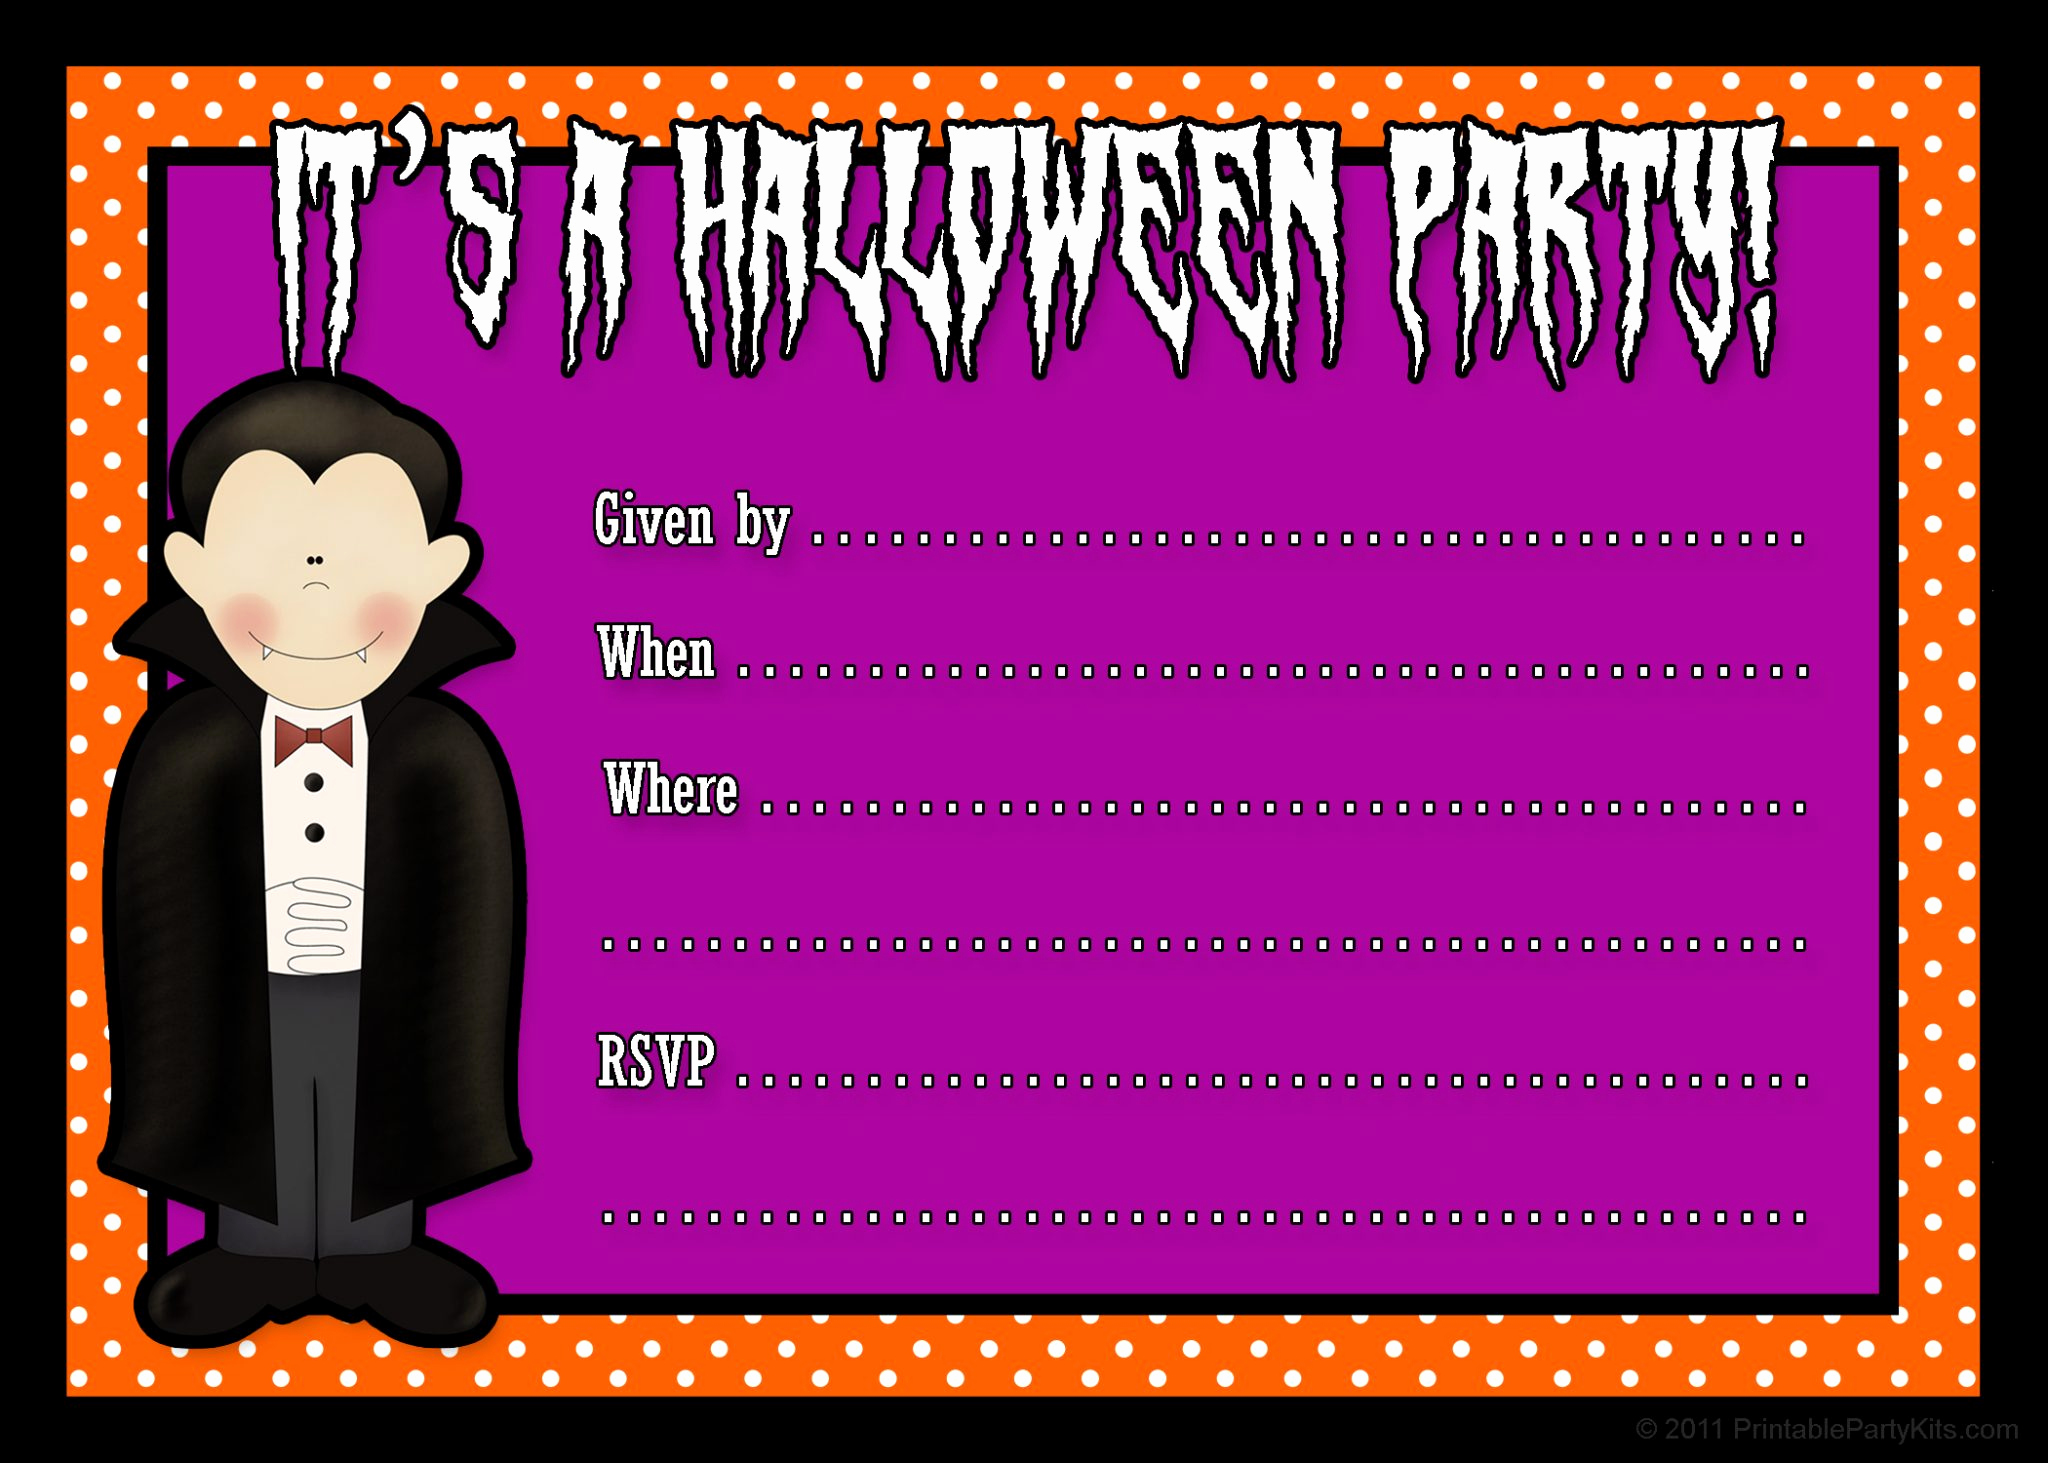 Free Halloween Party Invitation Templates Lovely Free Printable Halloween Party Invites